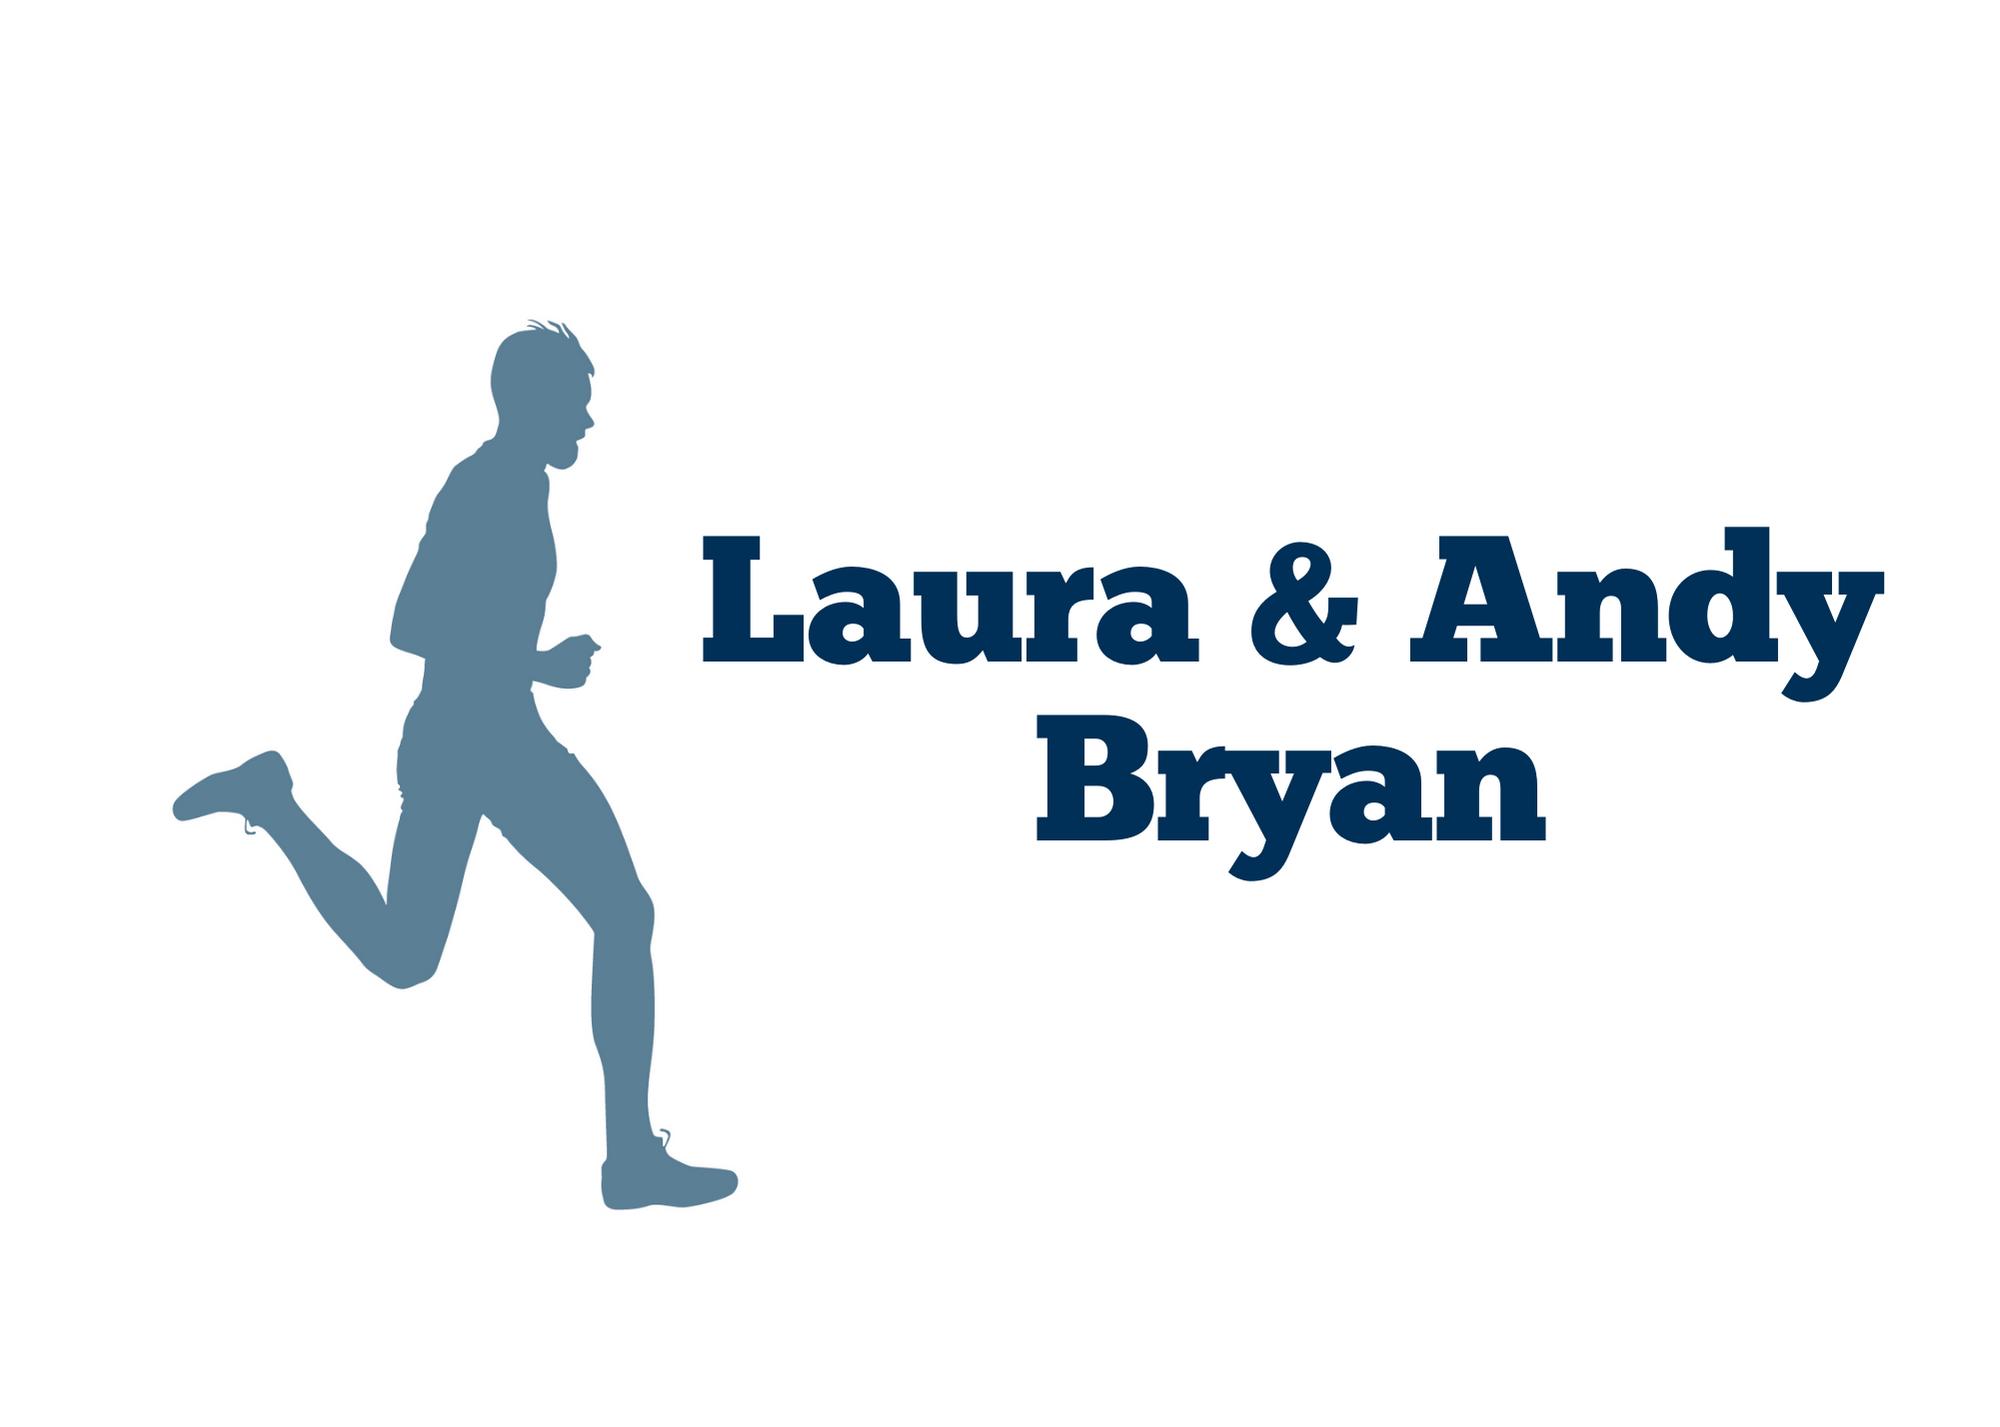 Laura & Andy Bryan